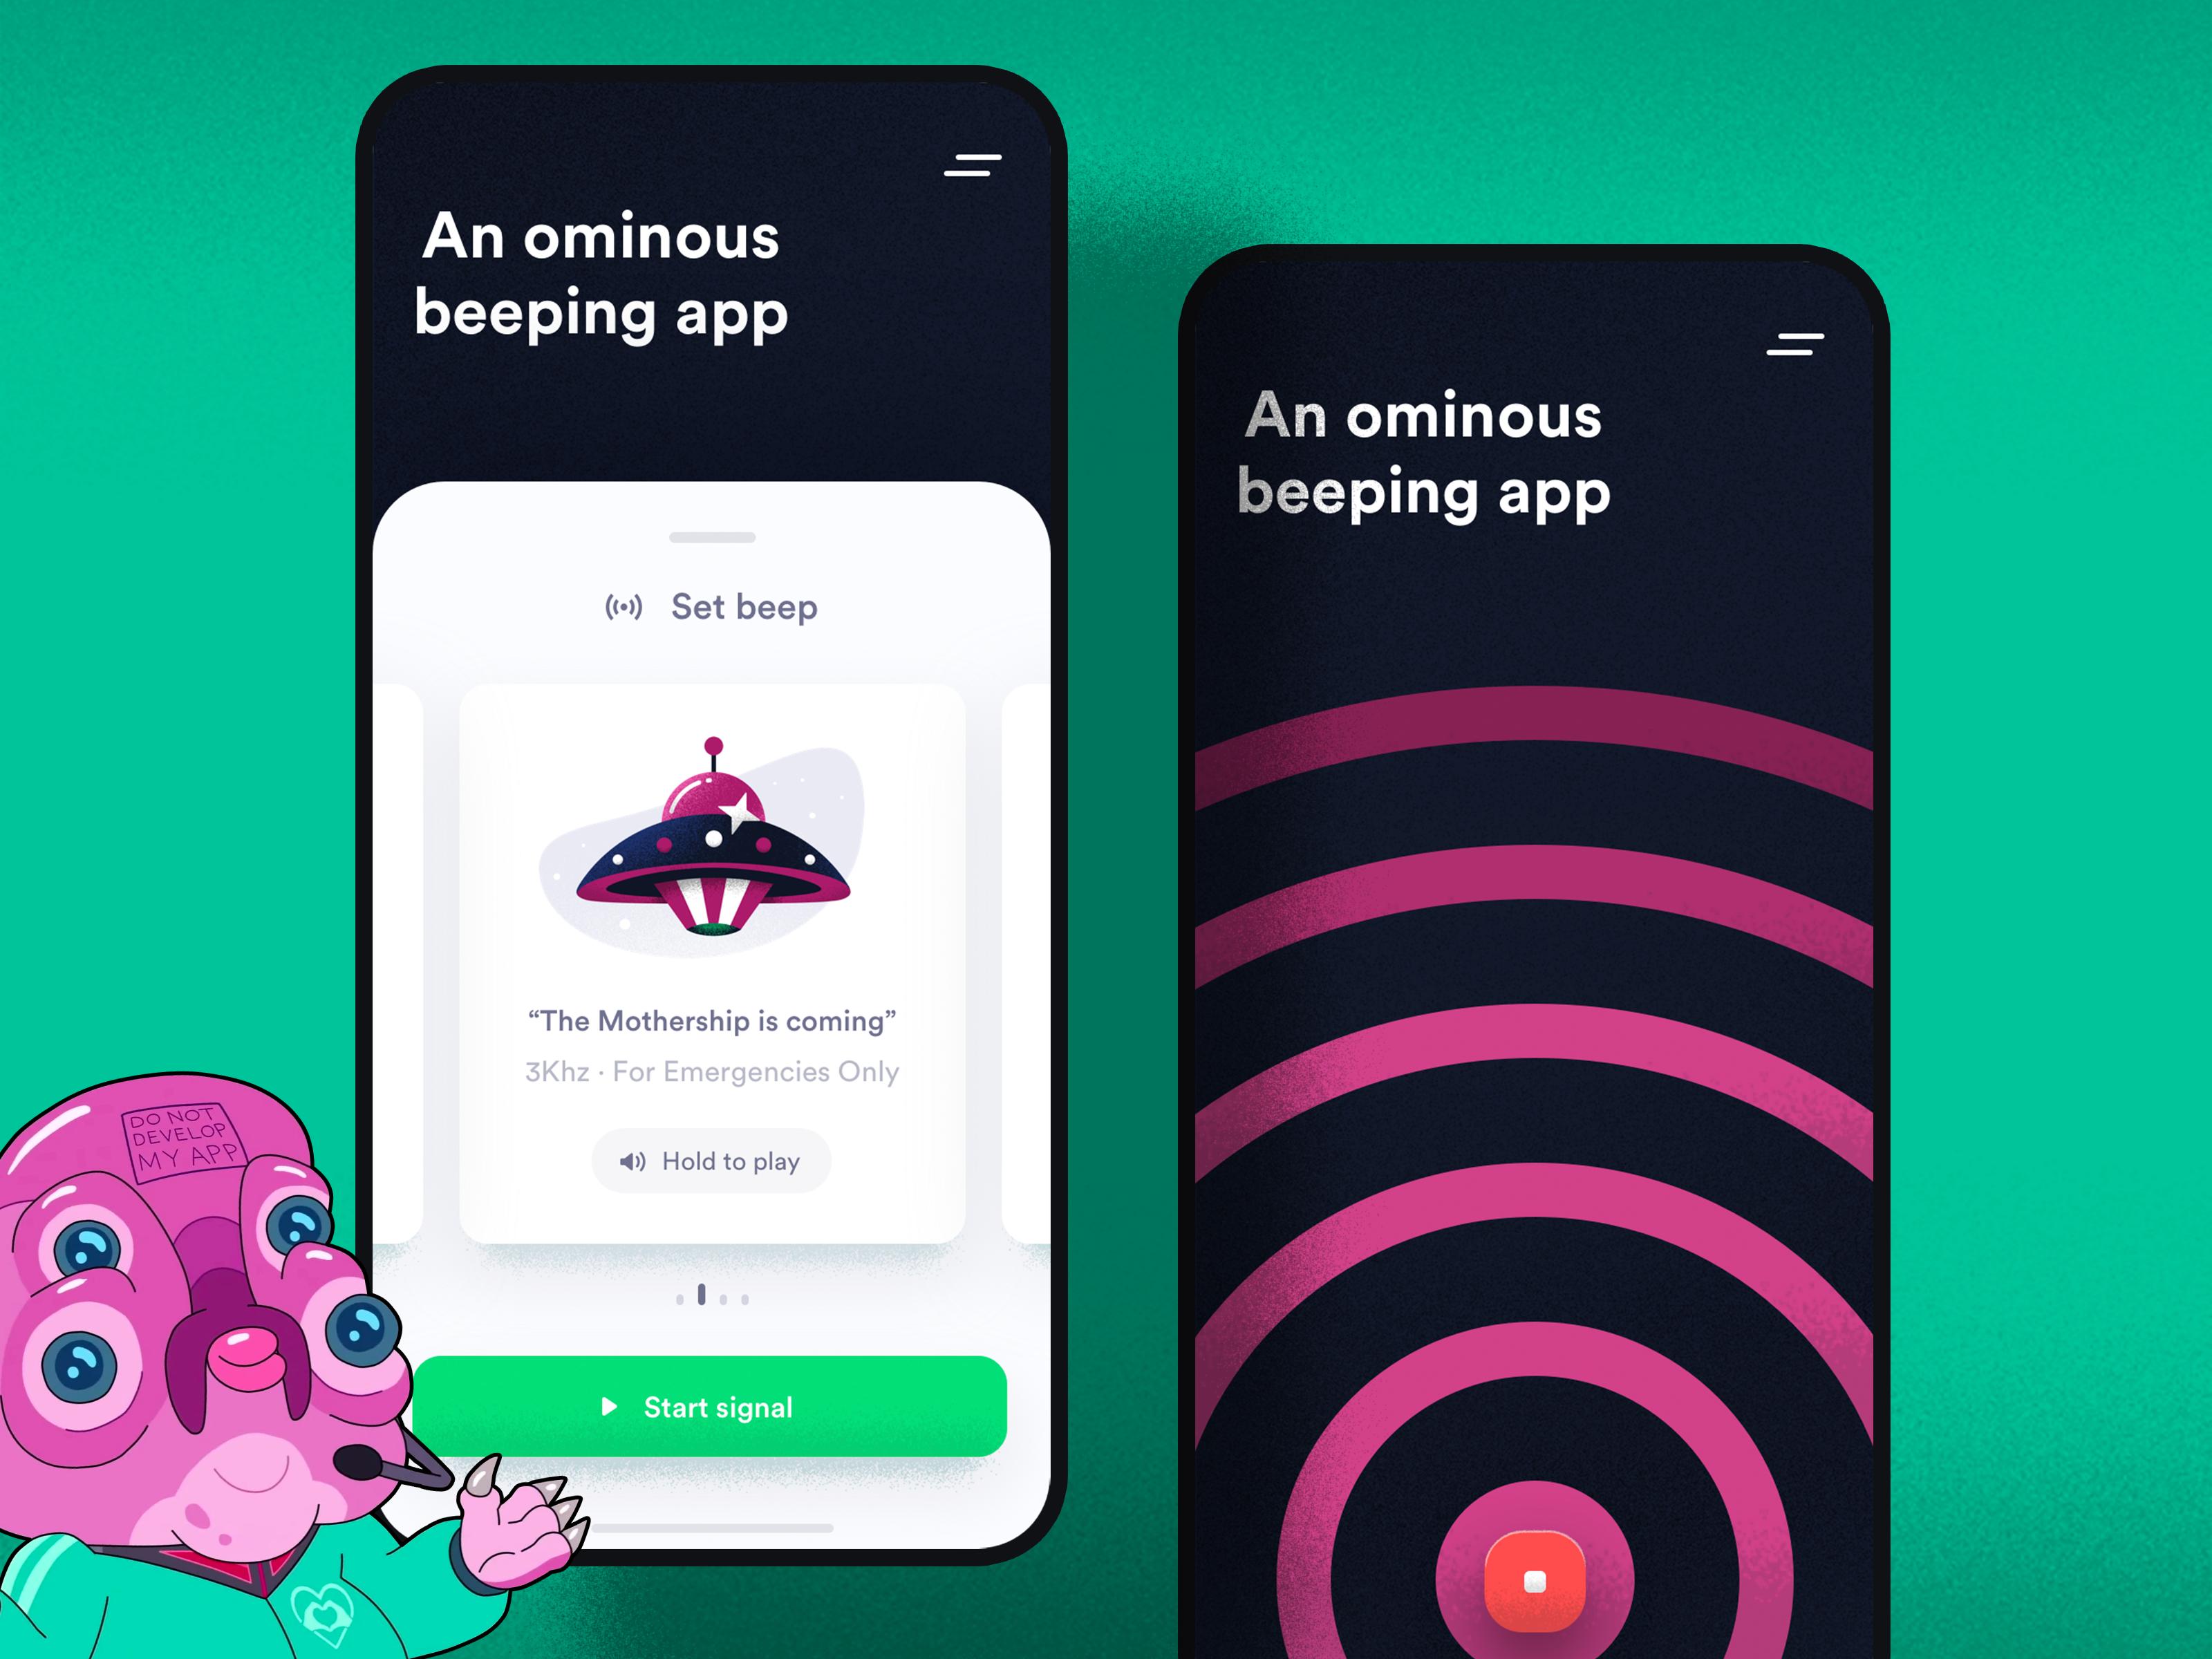 Omnious beeping app